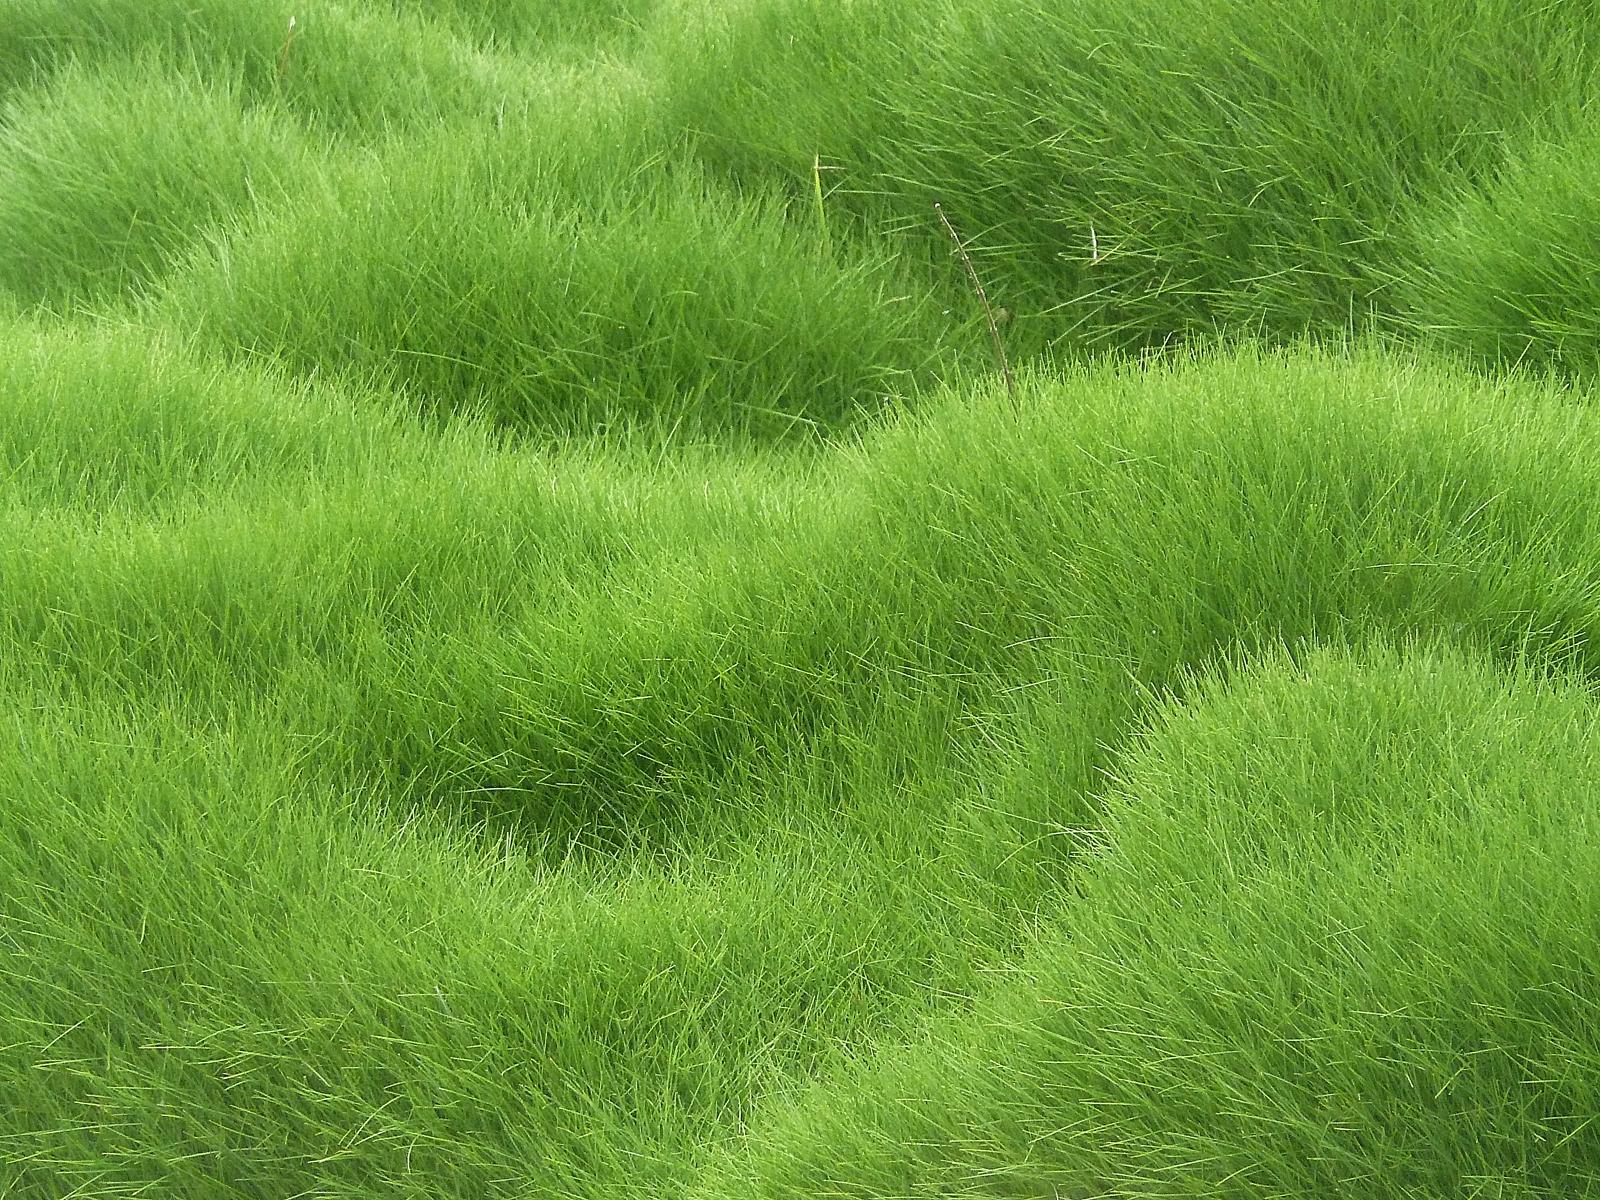 Wallpaper Field Green Texture Herb Flower Grassland Pasture Meadow Lawn Prairie Soil Land Plant Ecosystem Shrub Grass Family 1600x1200 Goodfon 608485 Hd Wallpapers Wallhere